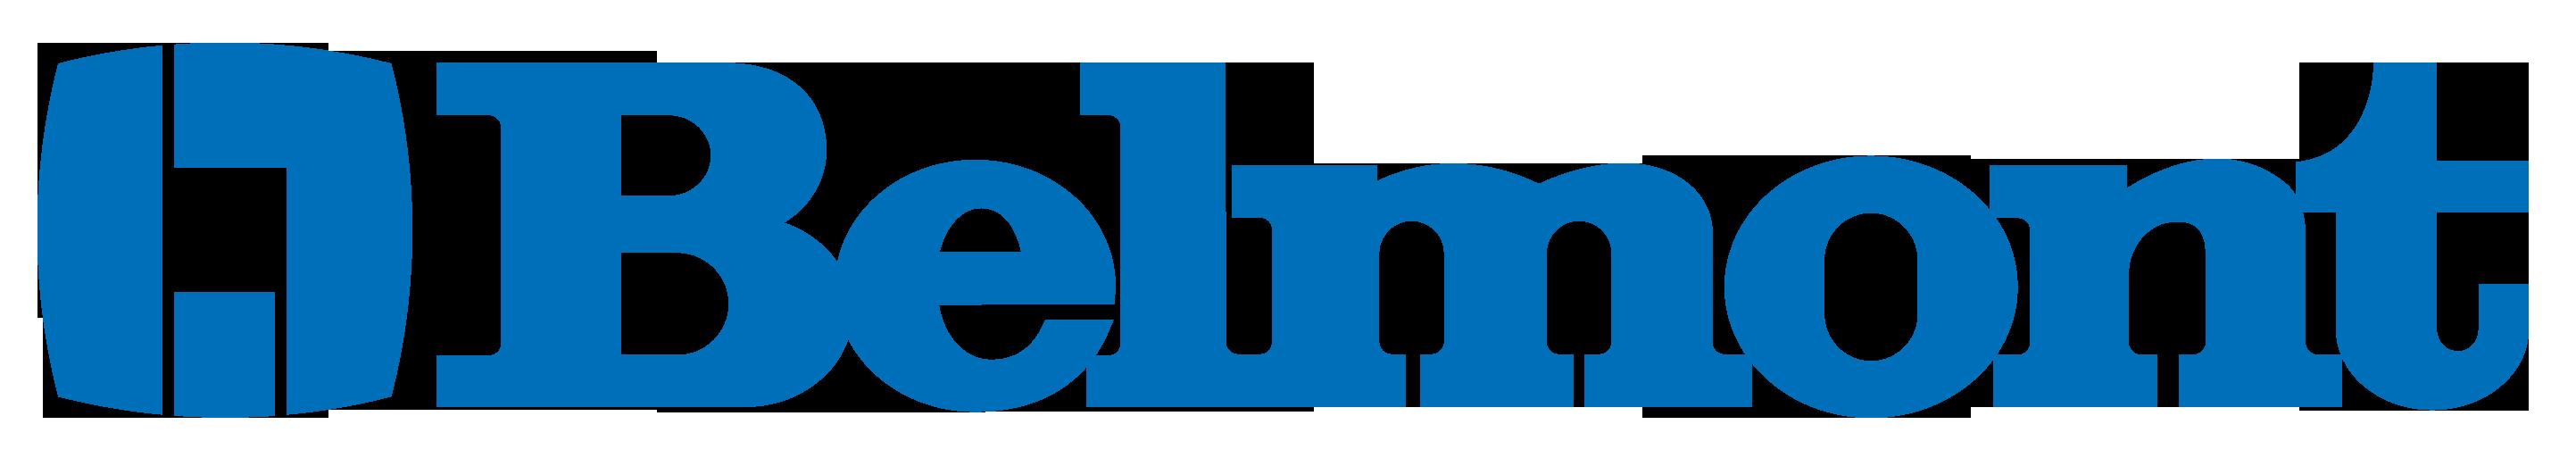 Belmont -Japón- Unidades odontologicas